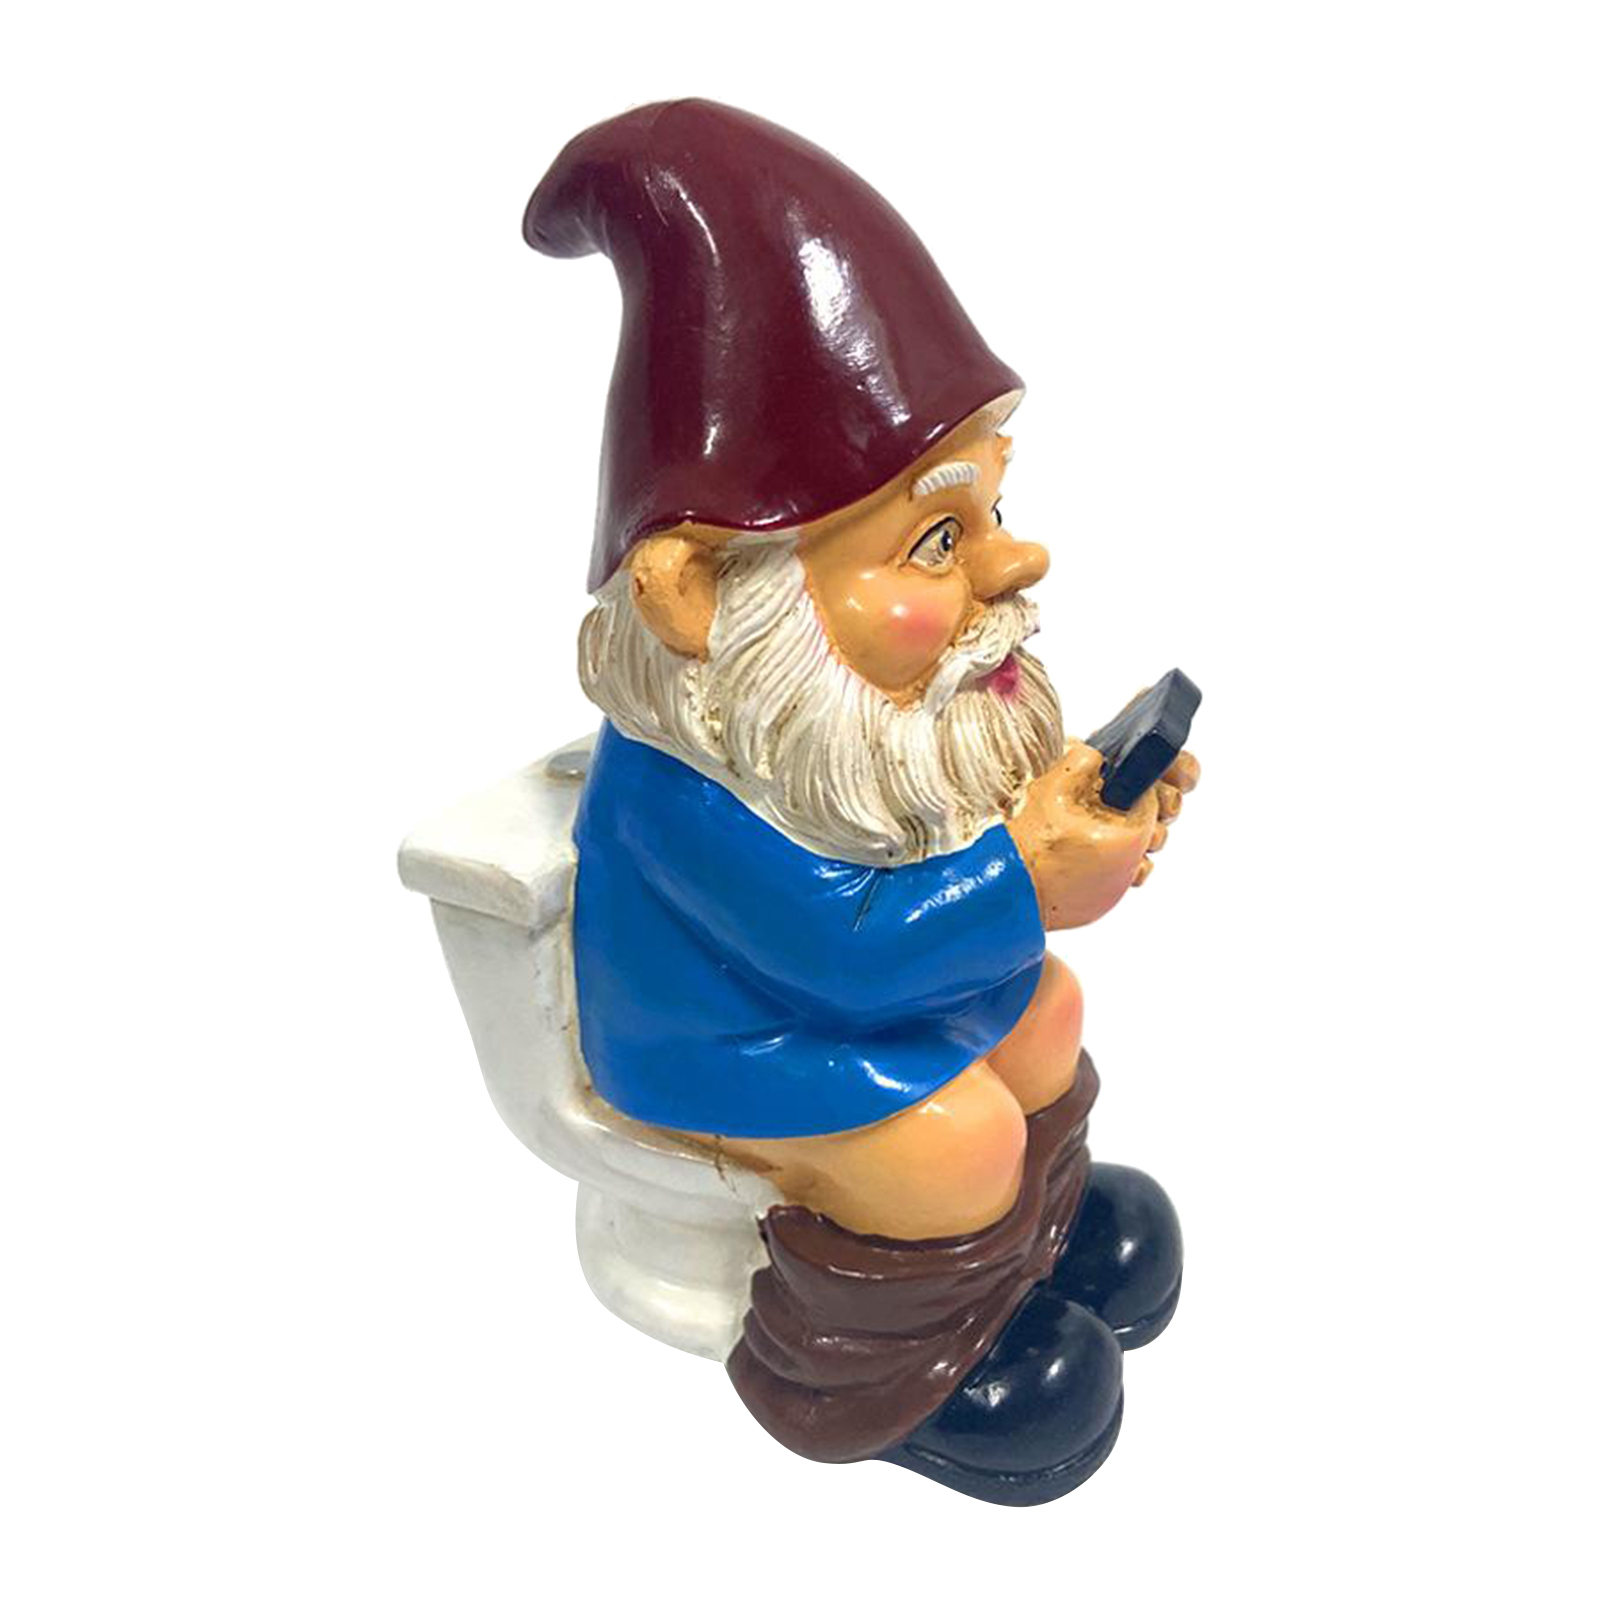 thumbnail 34 - Funny Resin Naughty Garden Gnome Statue Ornaments Outdoor Villa Home Figurines